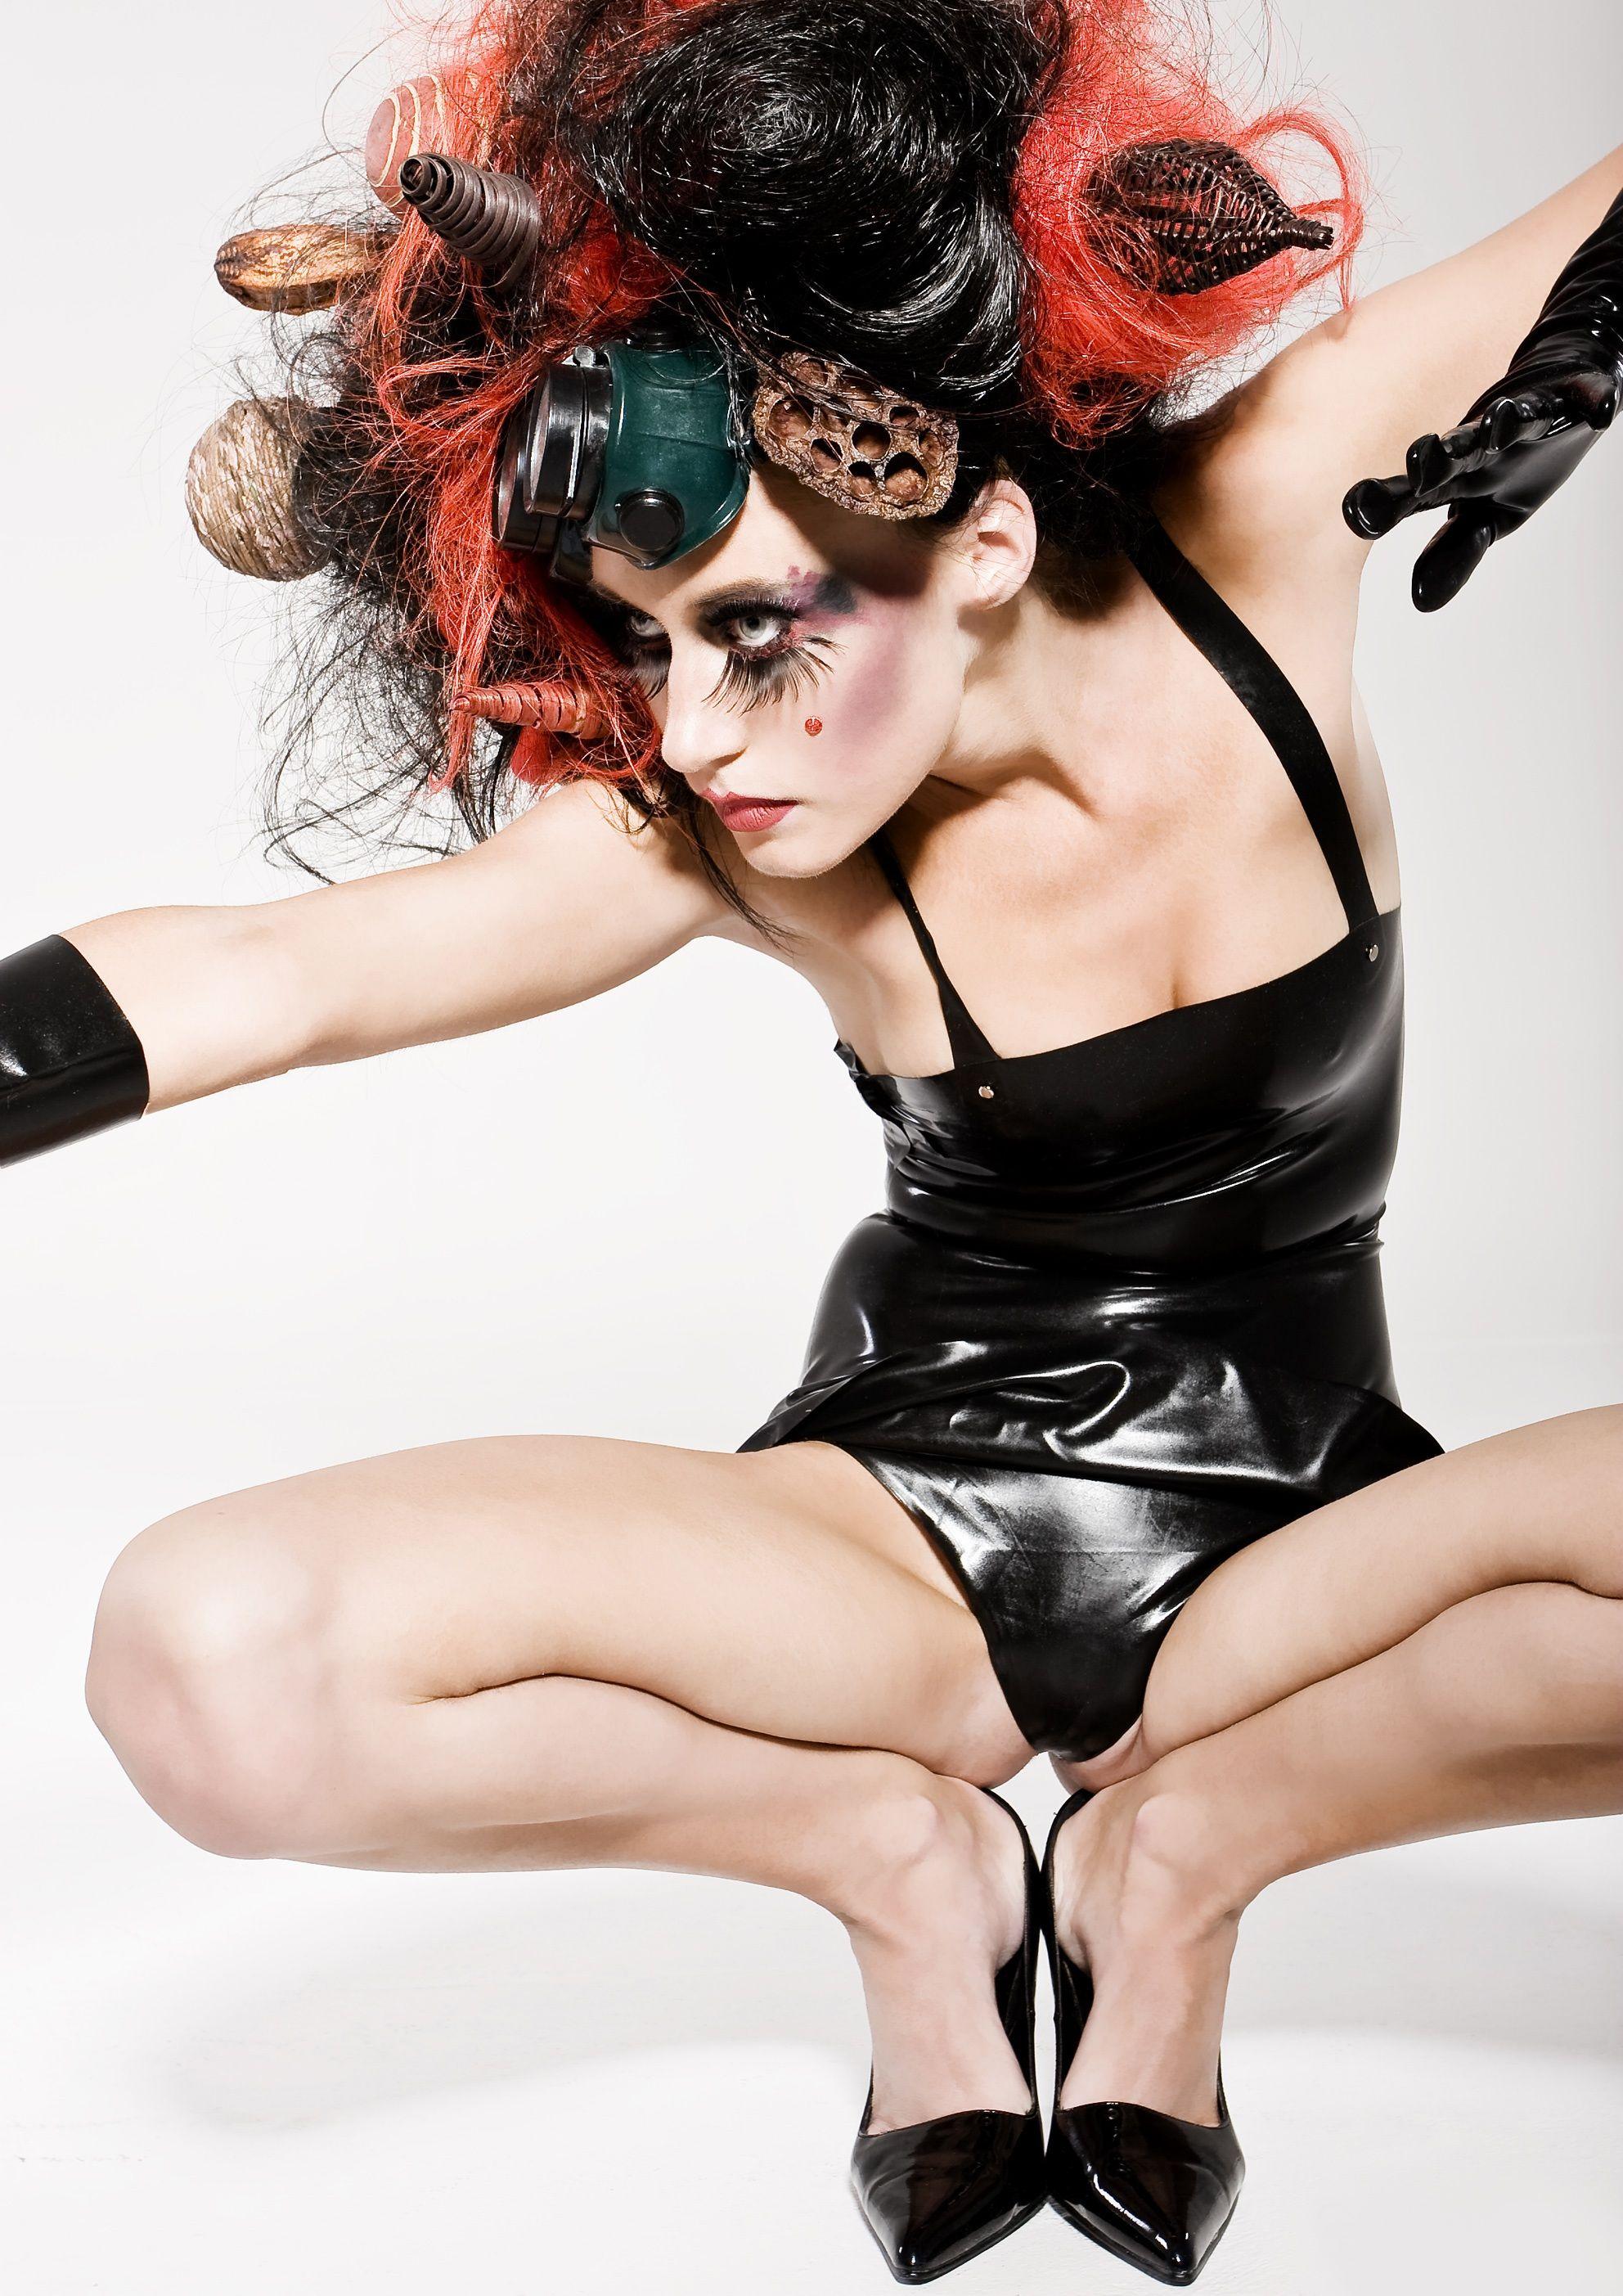 Pin by Laney Hitt on Never wear this Avant garde hair